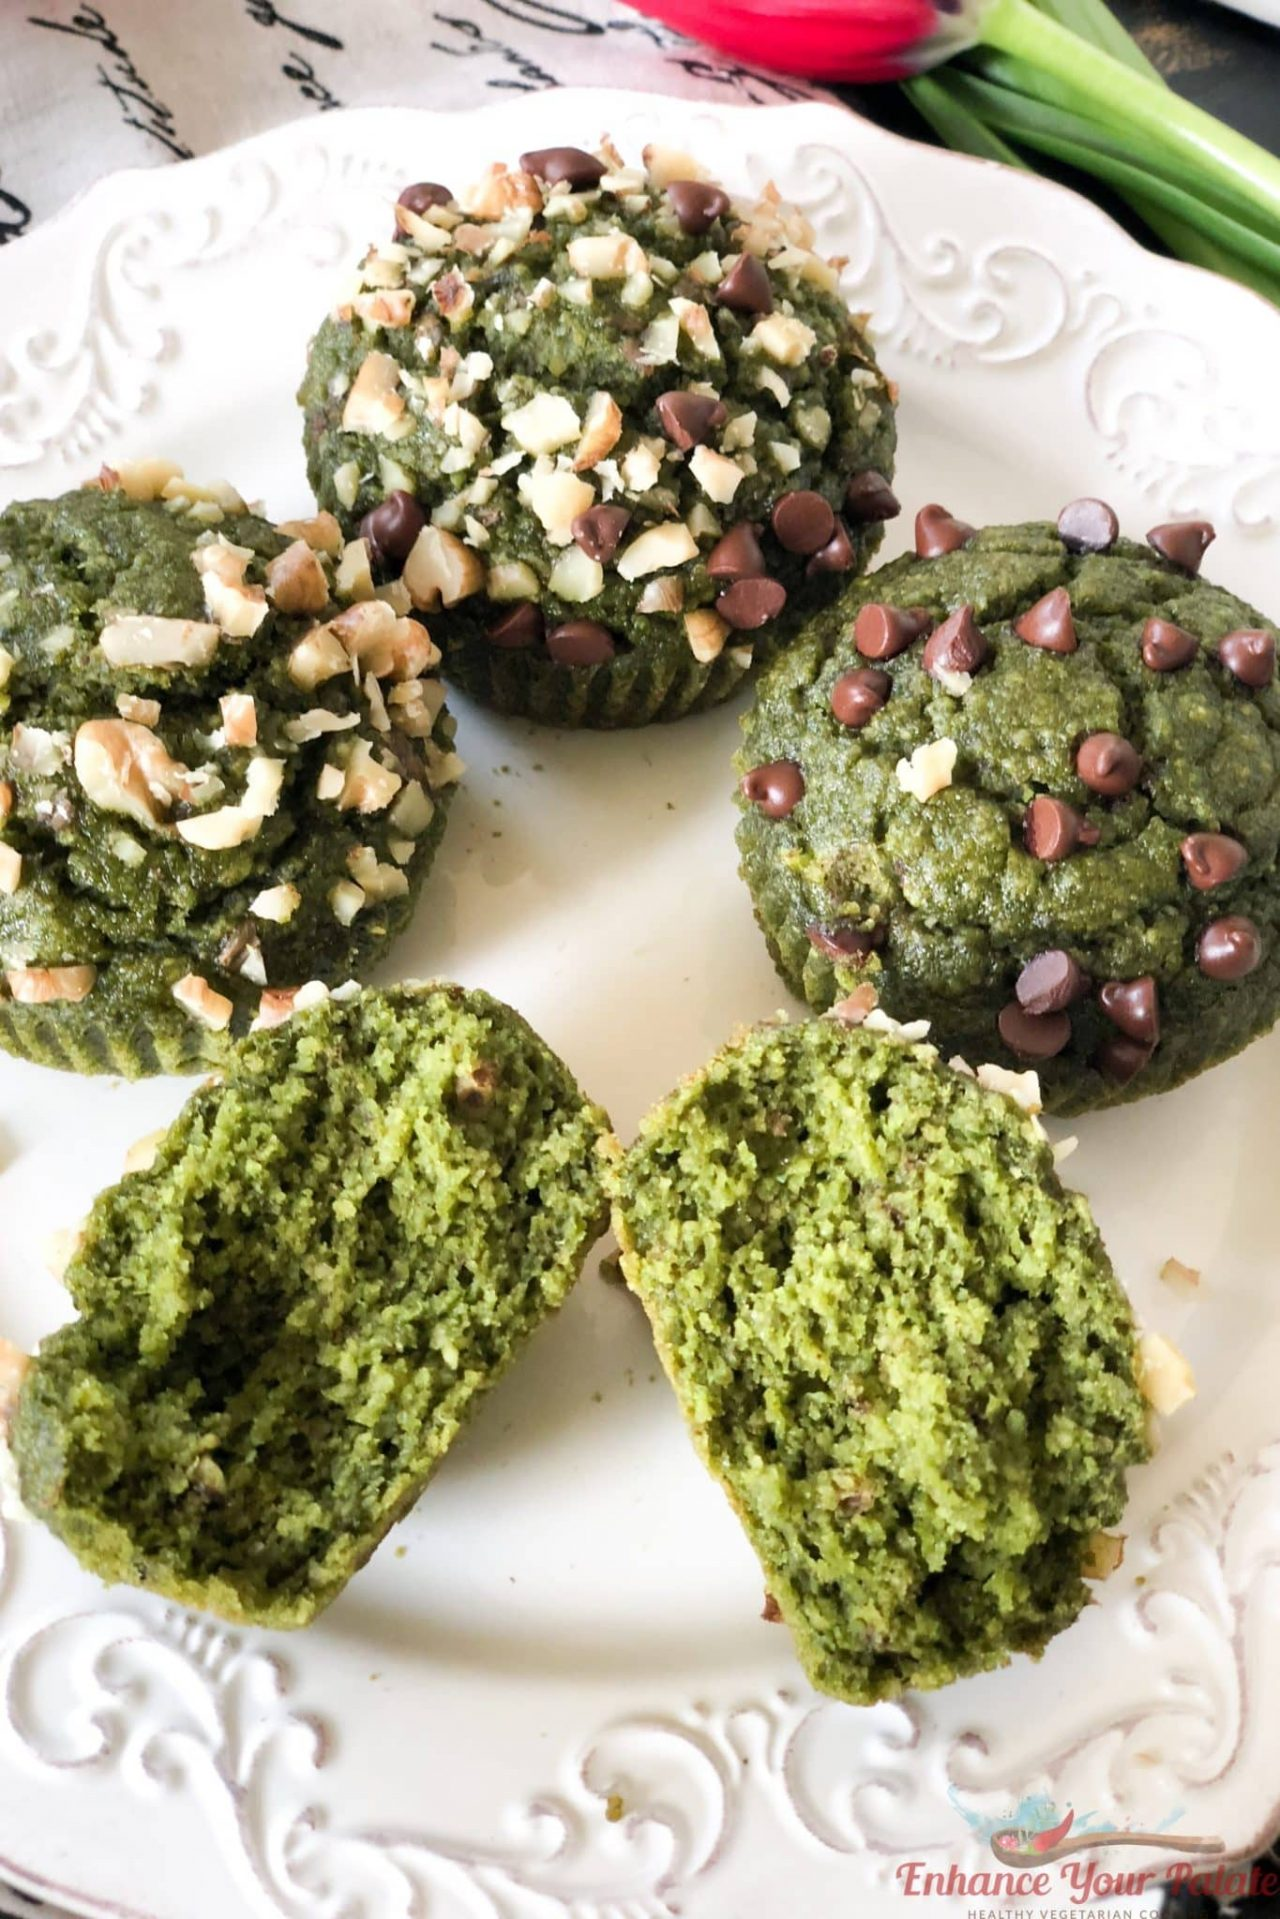 Gluten Free Eggless Vegan Muffins